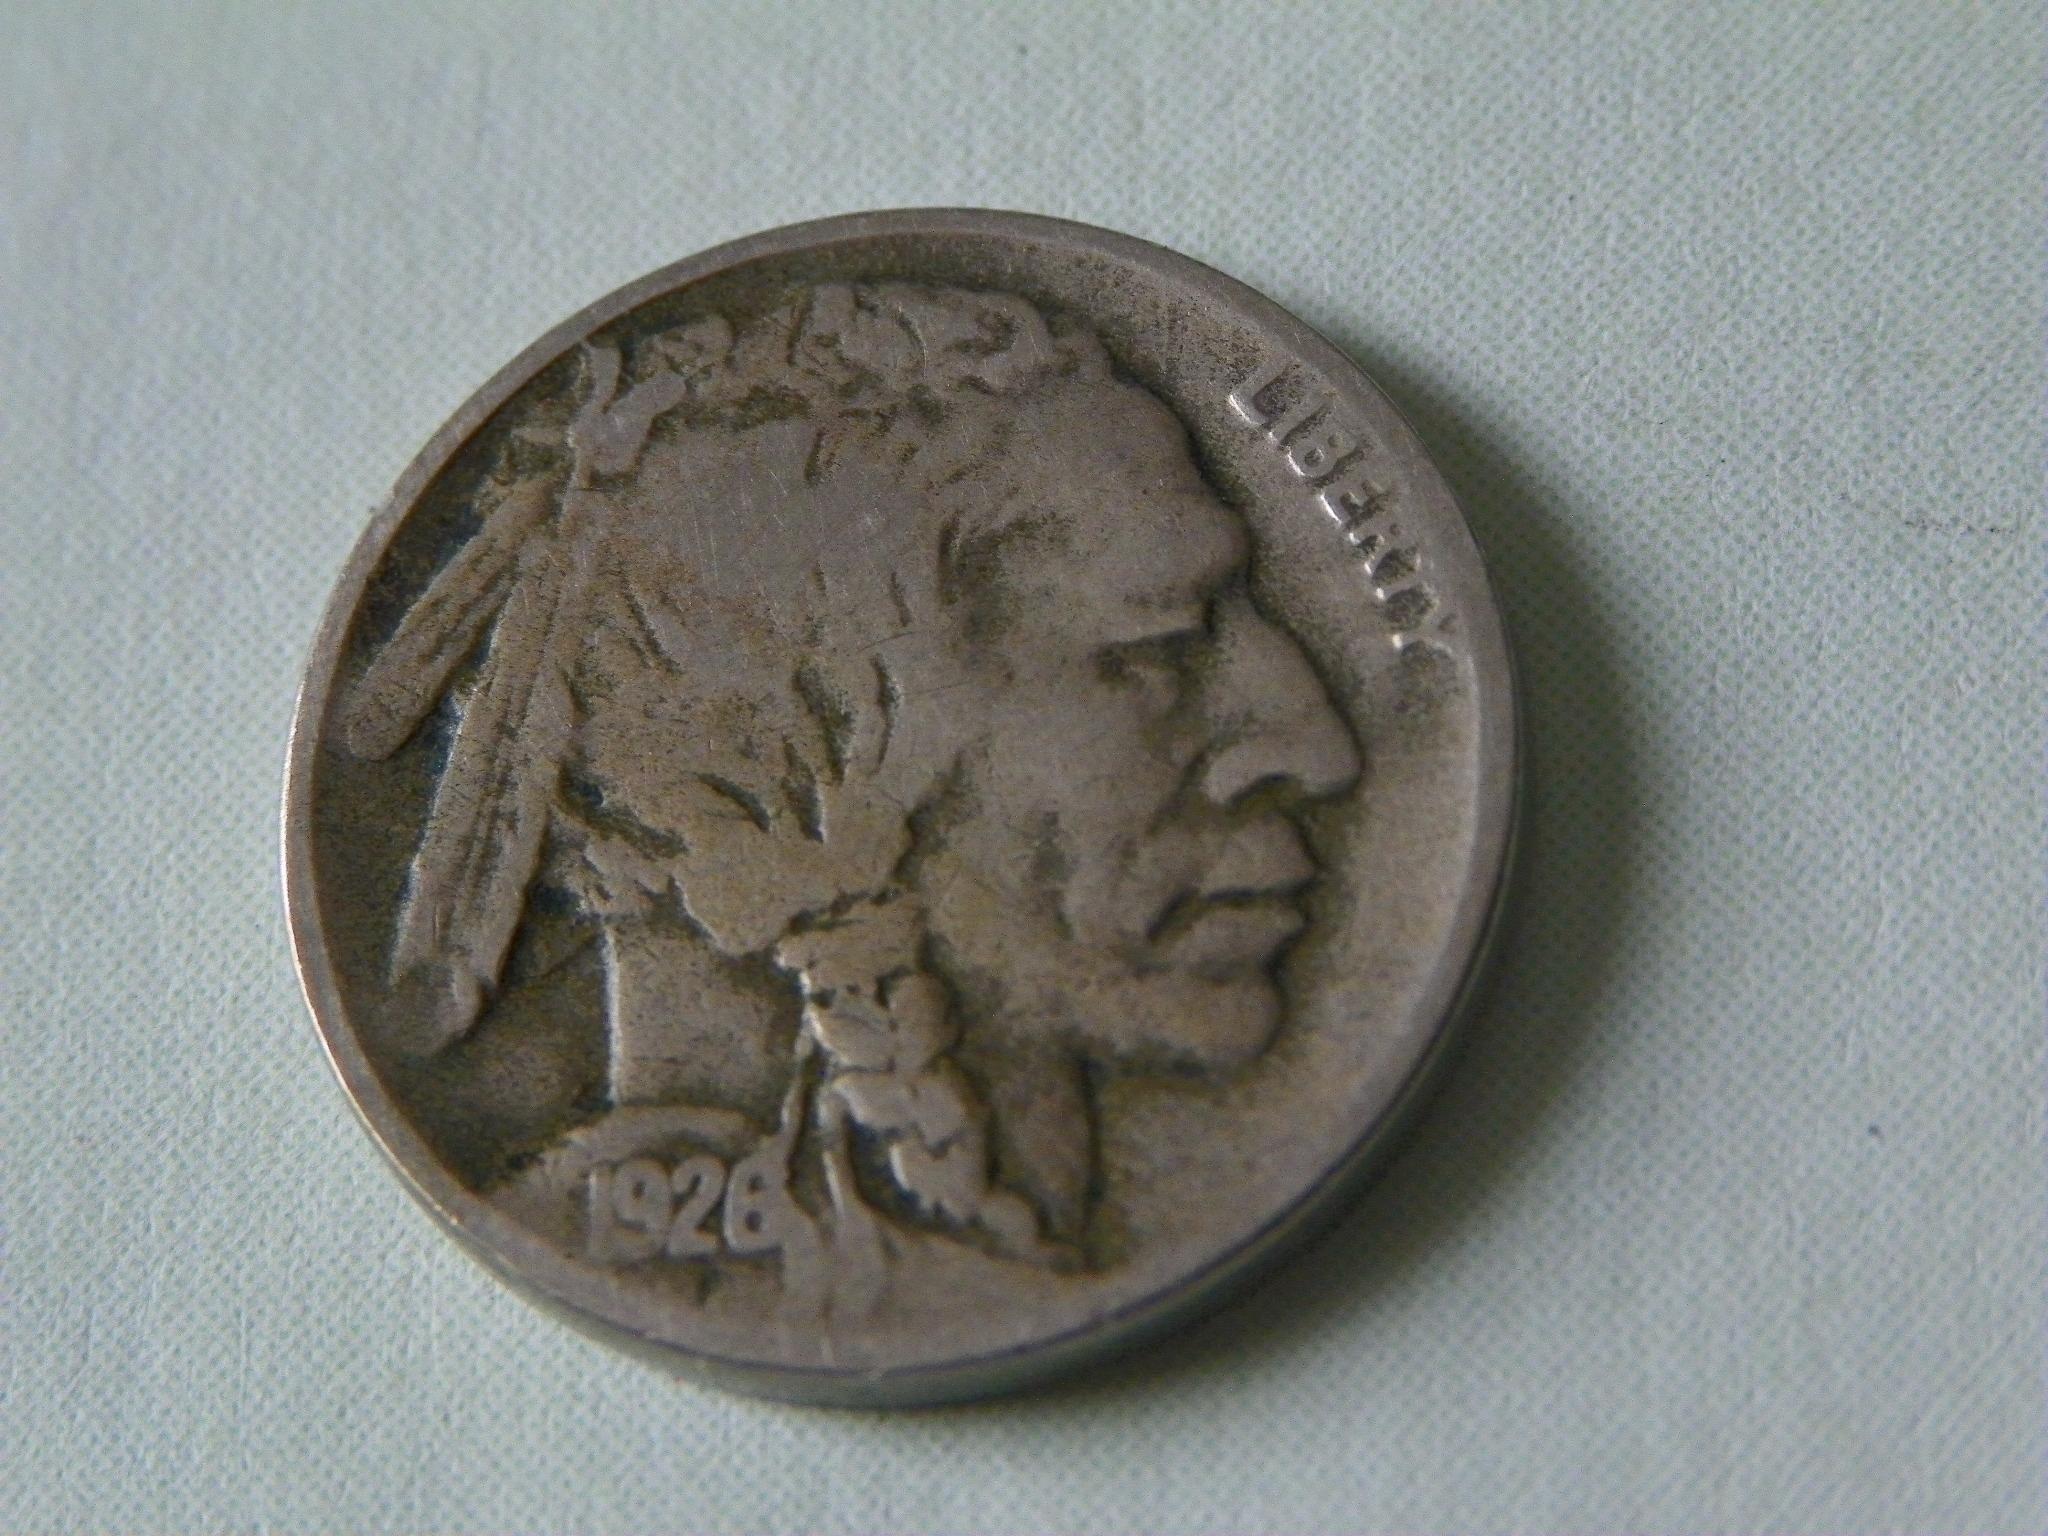 1926-D US Buffalo Nickel Five-Cent Piece